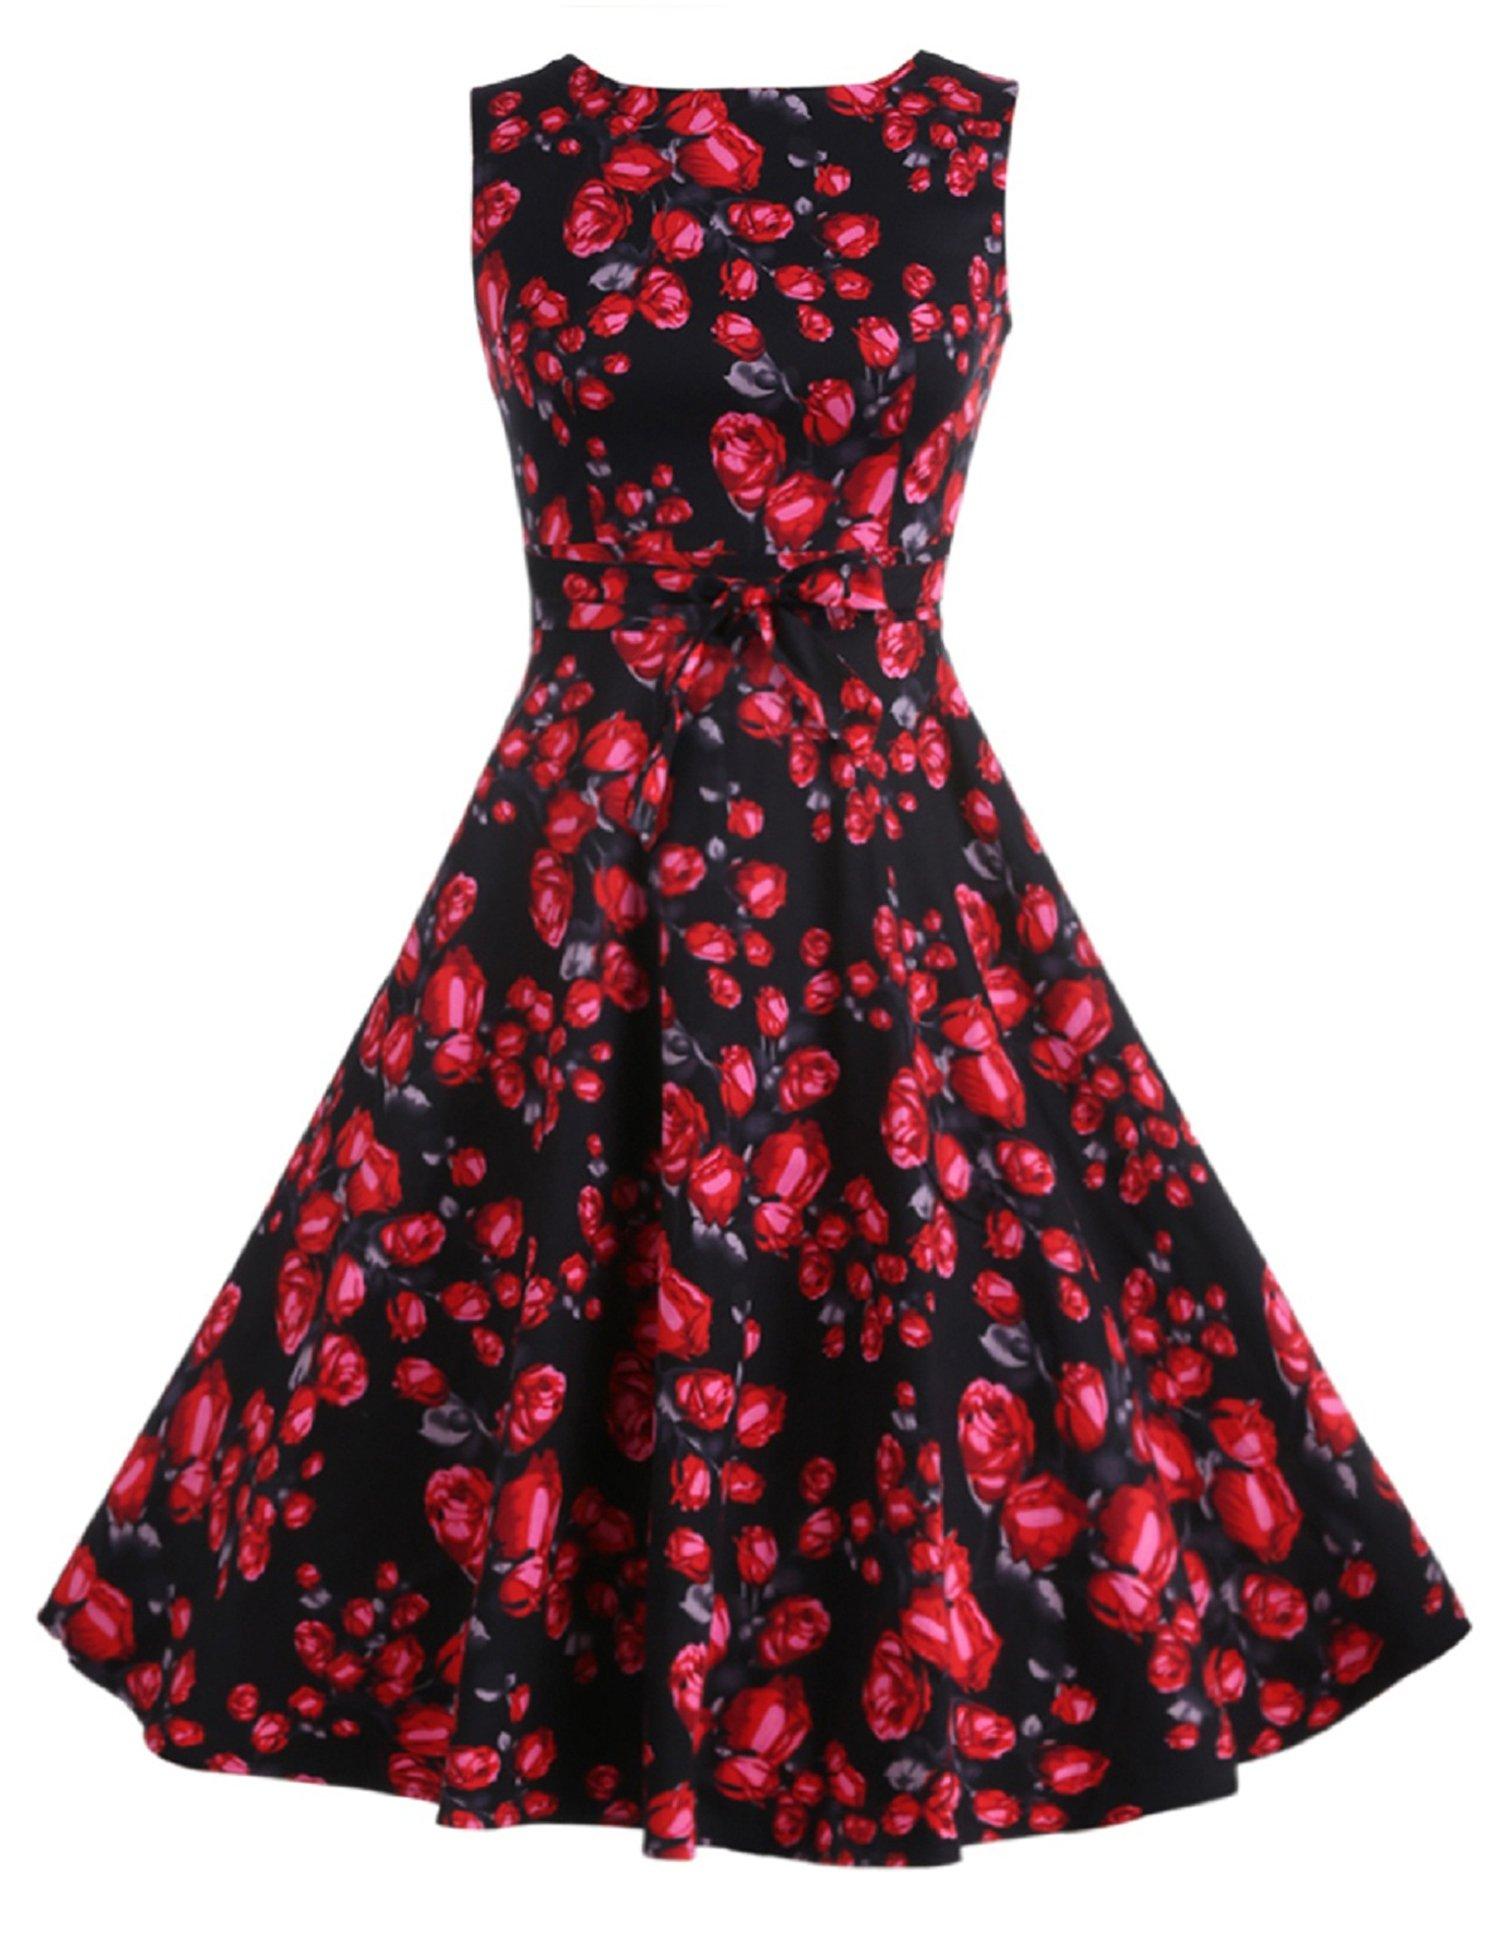 f8d14fa618 ACEVOG 1950s Vintage Hepburn Style A-line Sleeveless Cotton Swing Dress  Multi Colors S~Plus Size 4X